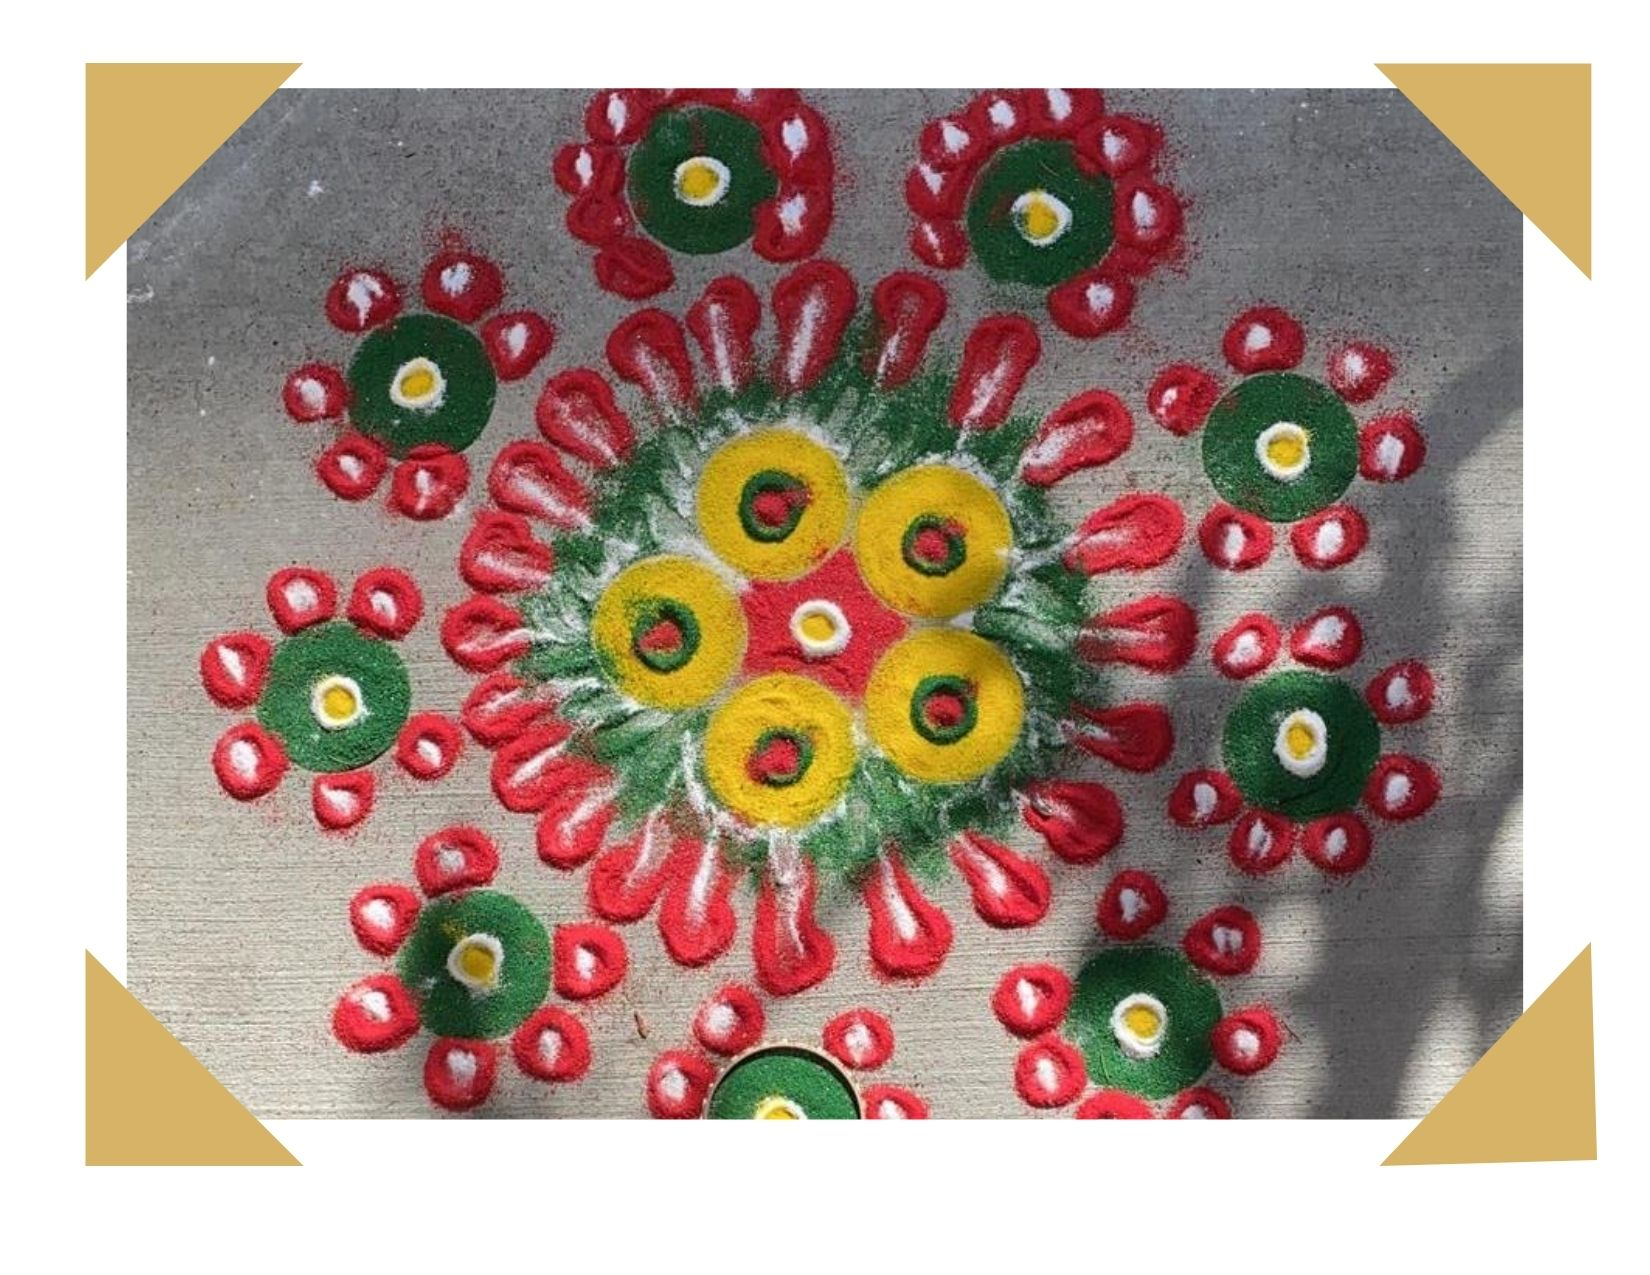 In Delight: Uplifting the Human Spirit|Diwali 2020